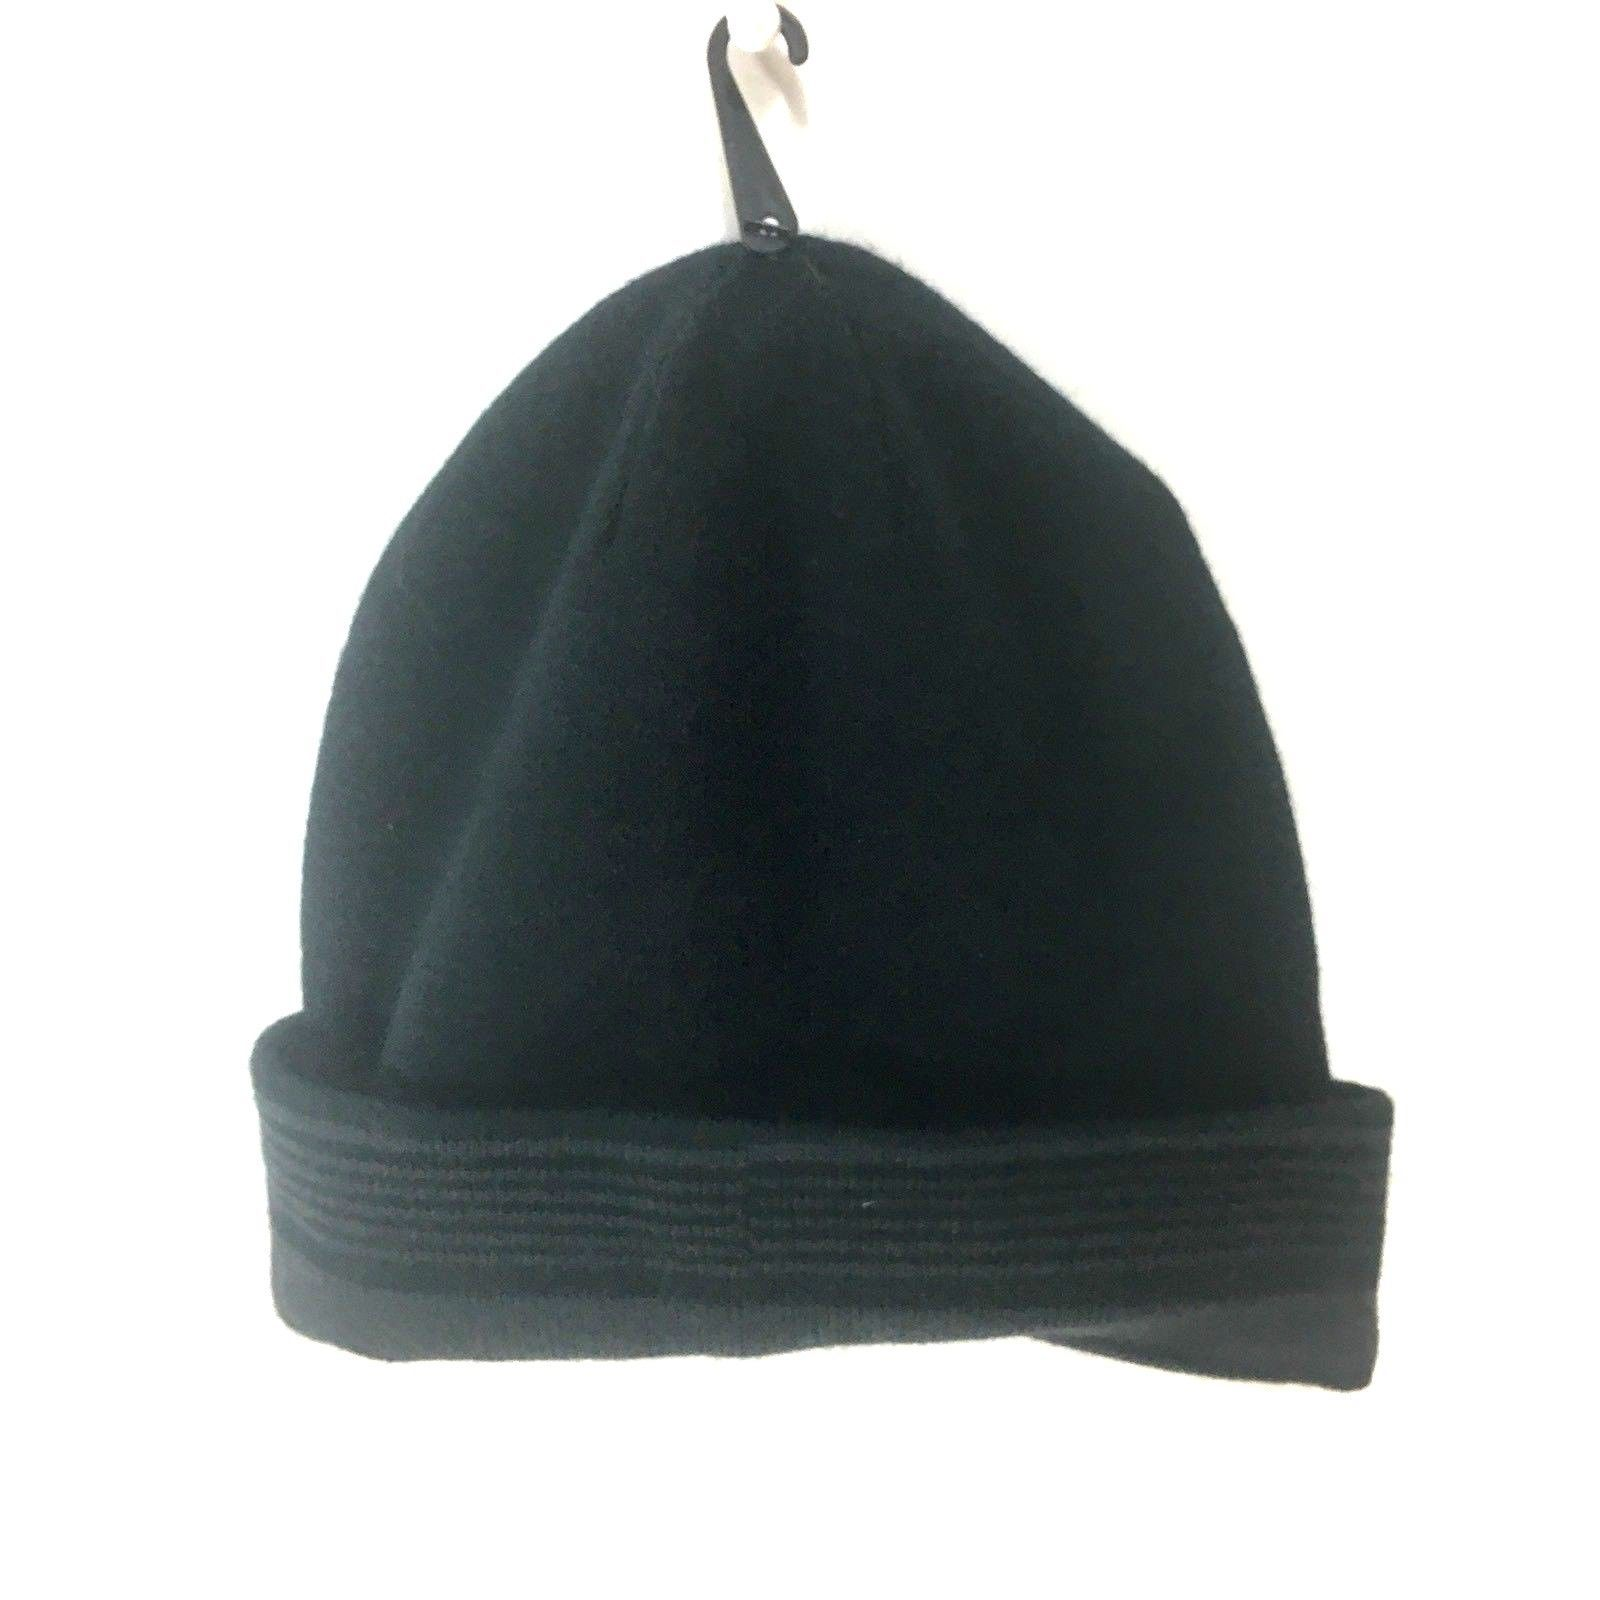 Van Heusen Mens Reversible Knit Hat Cap Beanie Black Gray Stripes  One Size NWT